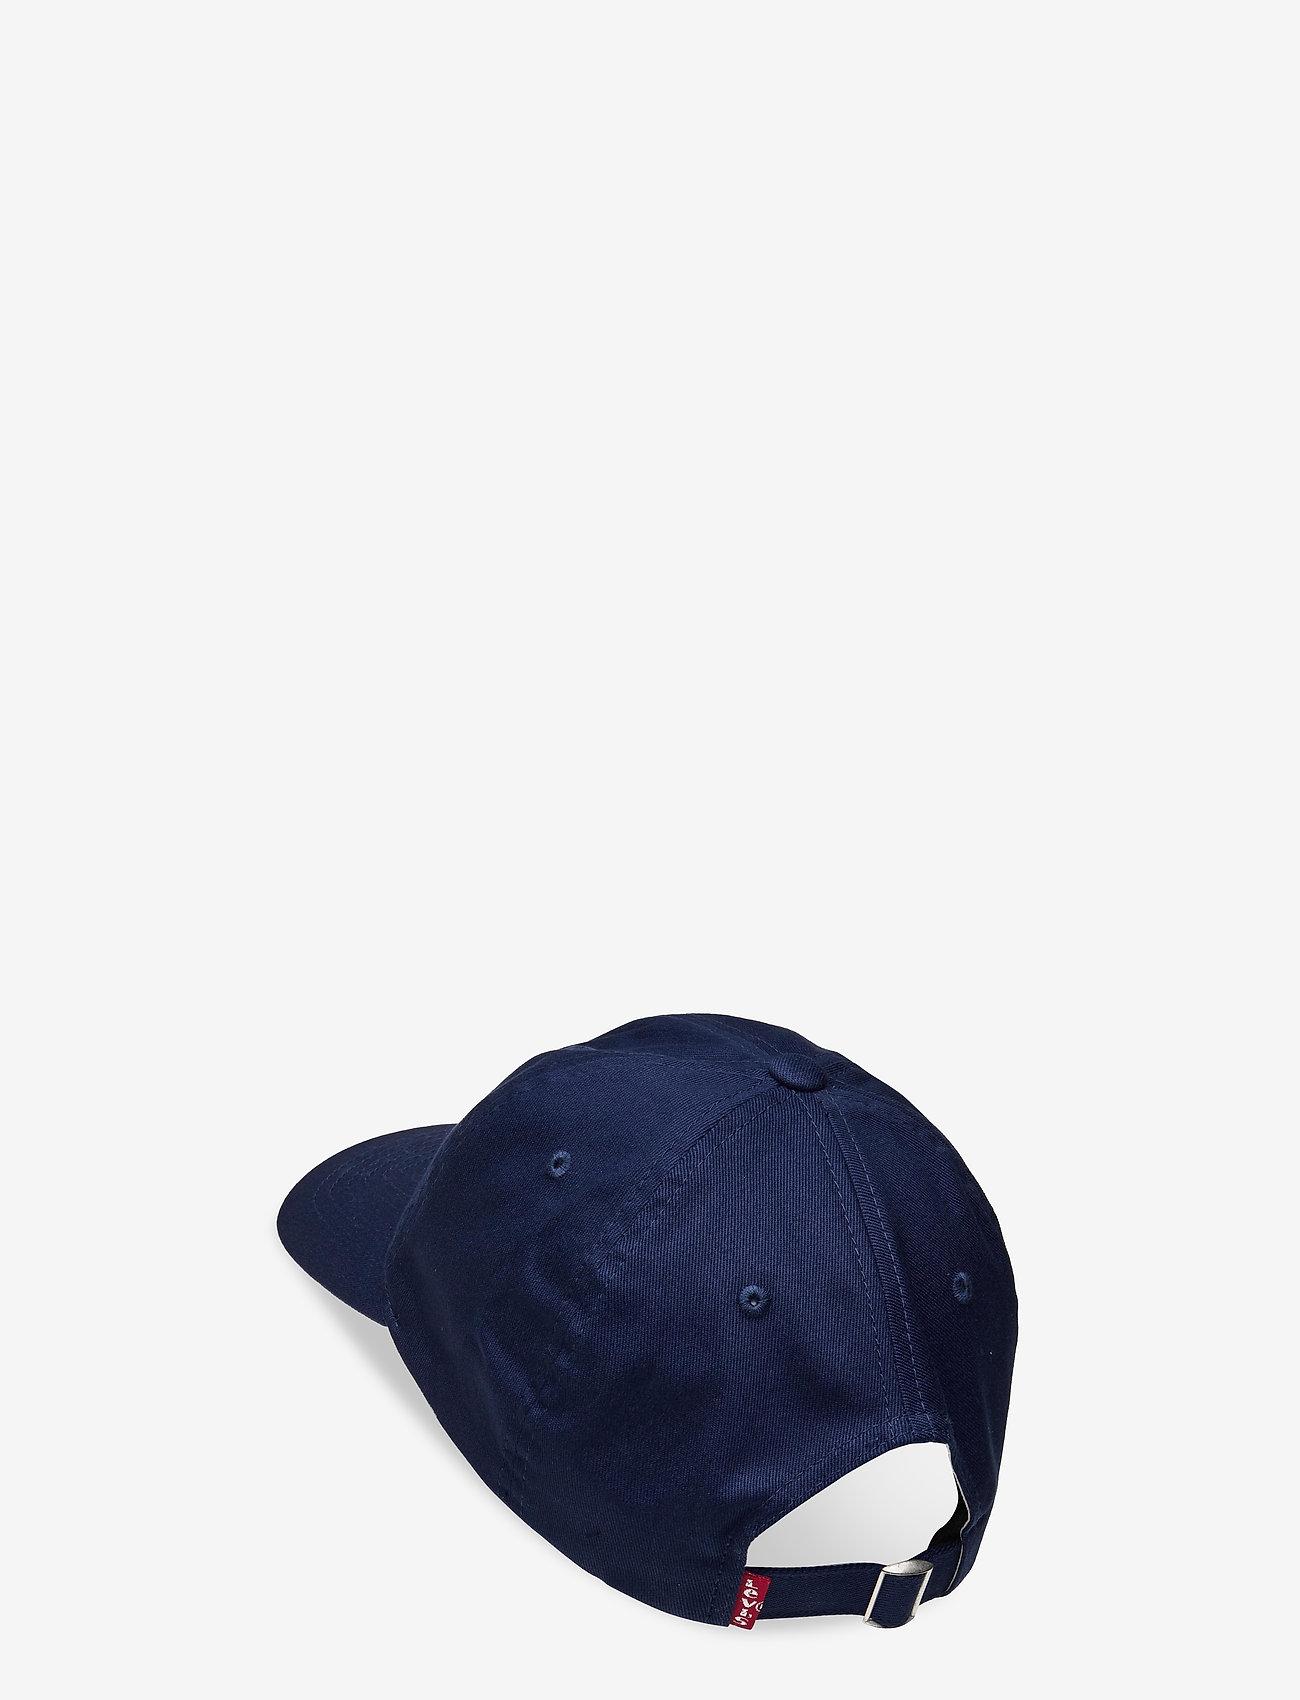 Levi's Footwear & Acc - VINTAGE MODERN FLEXFIT CAP - kepsar - navy blue - 1